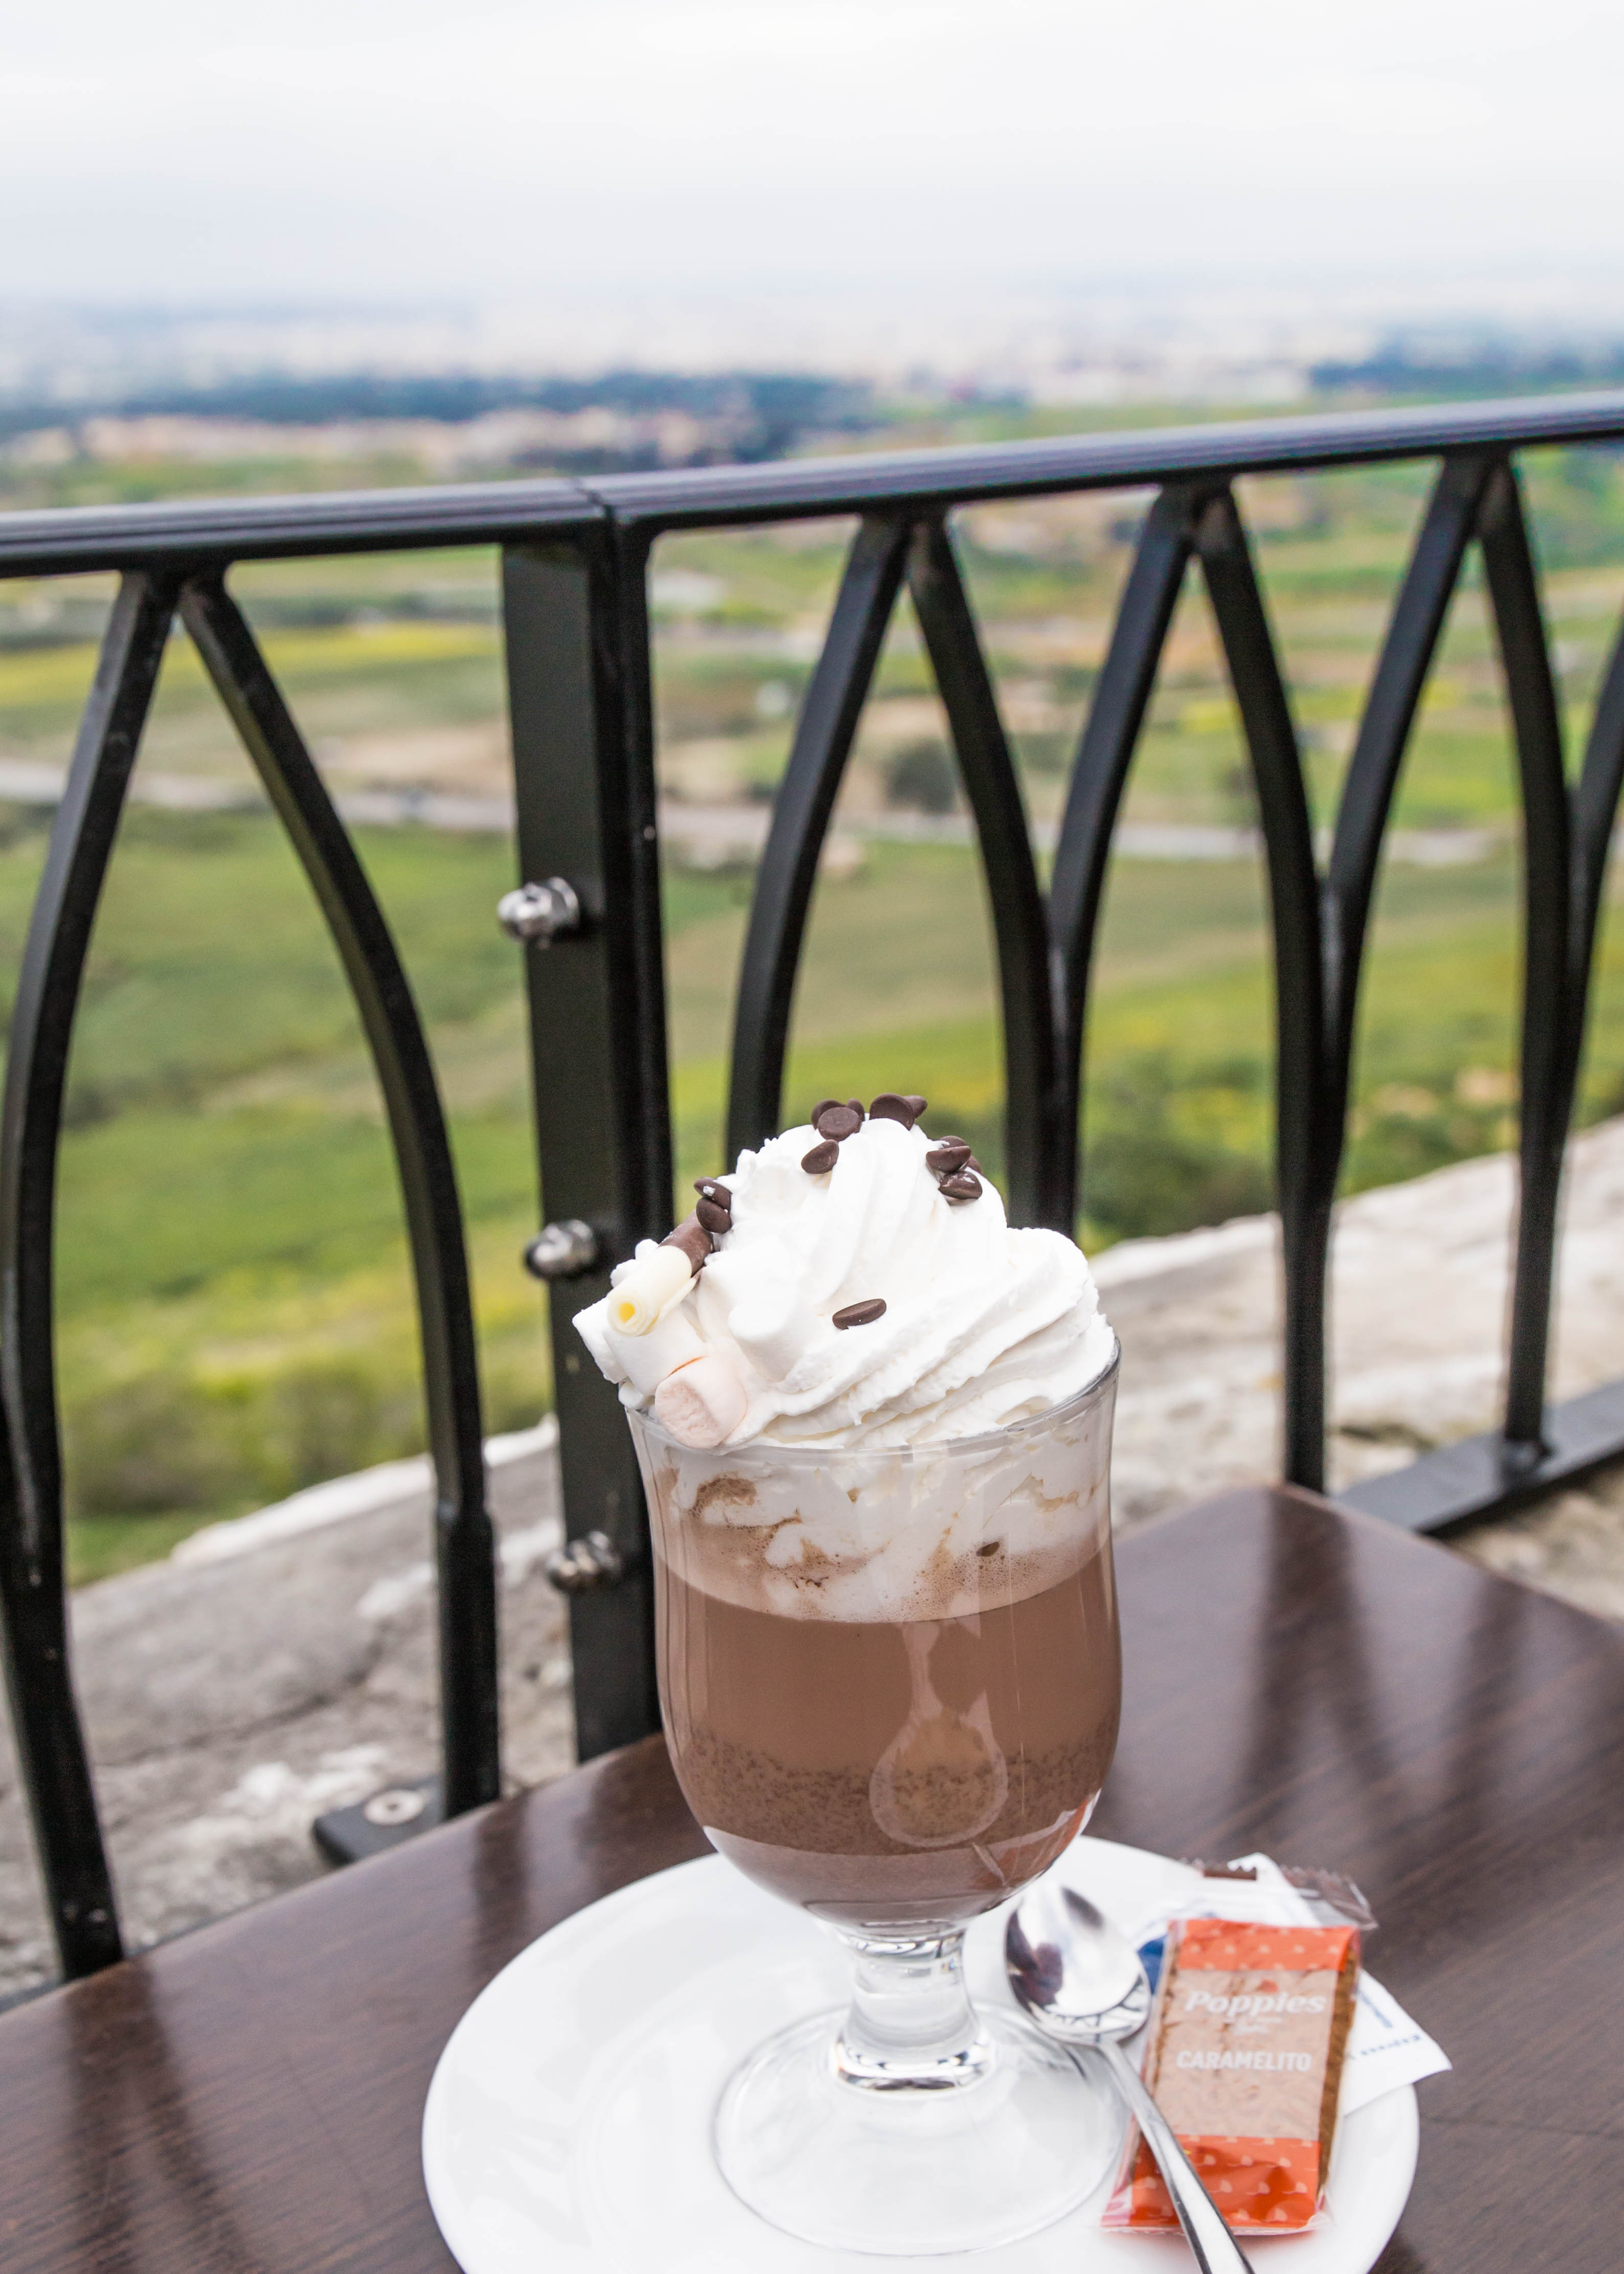 Where to visit in Mdina, Mdina Gate, Cafe in Mdina